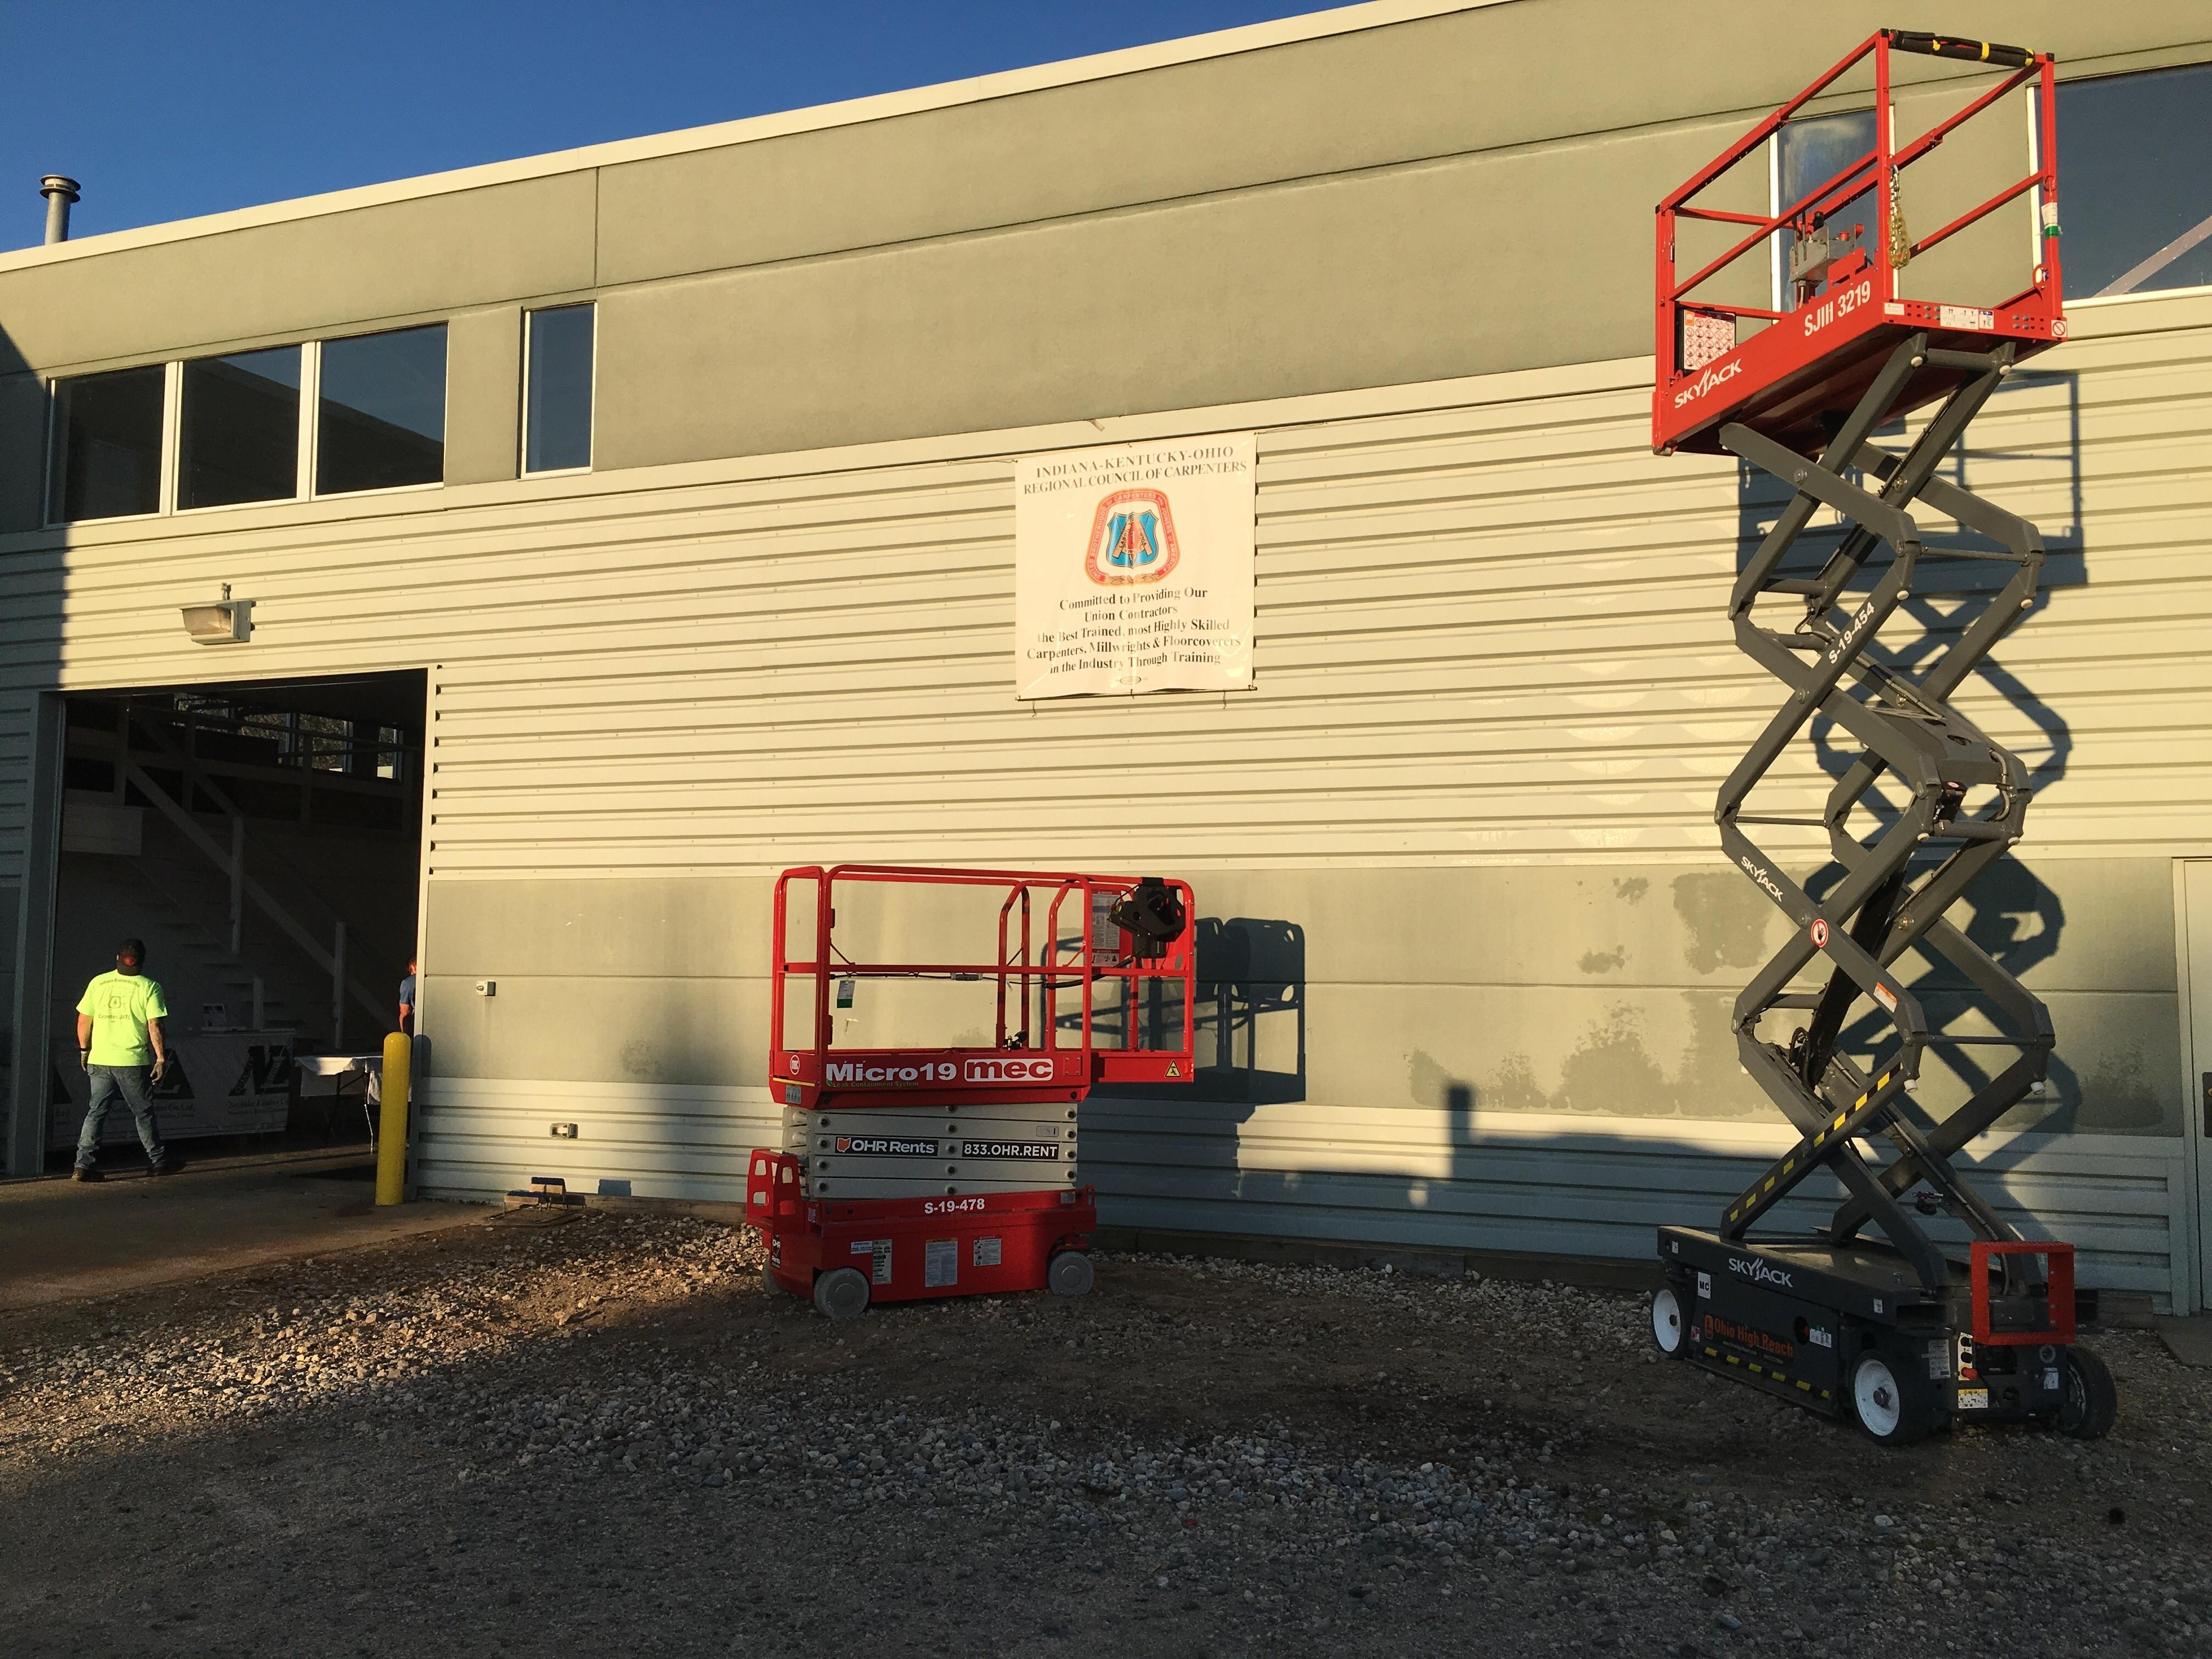 OHR Rents scissor lifts in Ohio